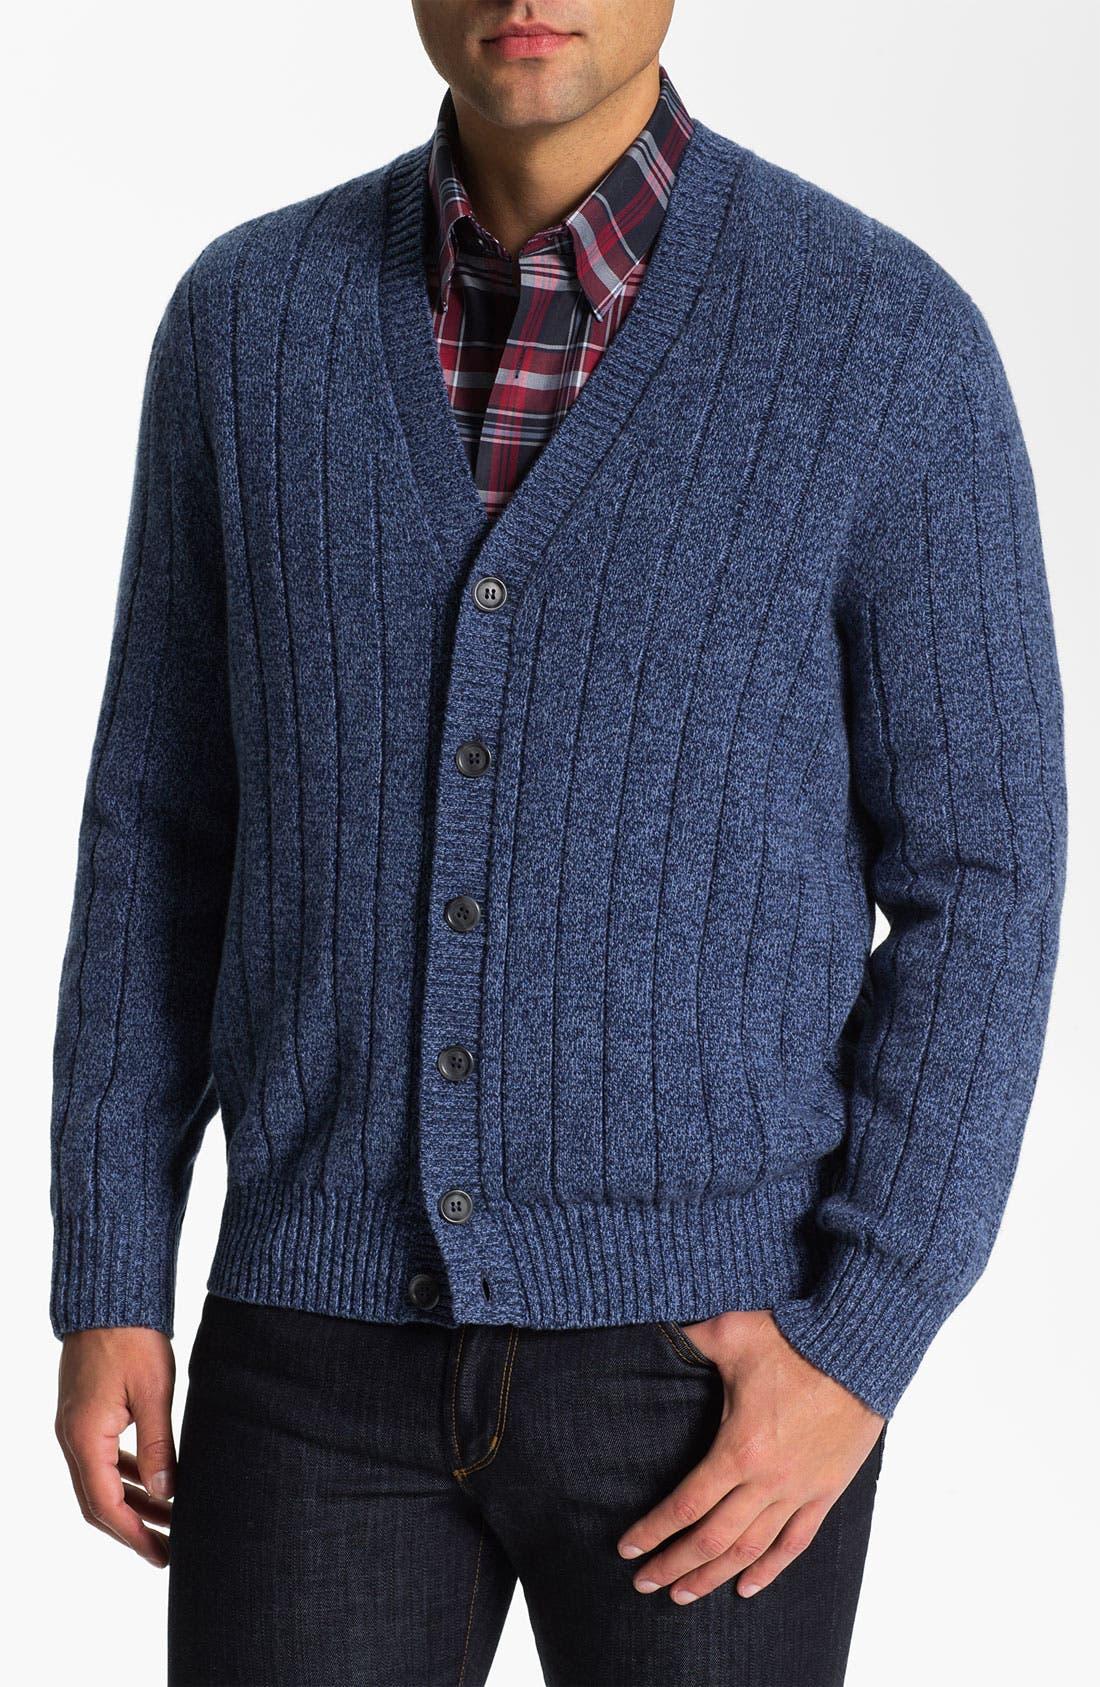 Alternate Image 1 Selected - Lora Gi Wool & Cashmere Button Cardigan